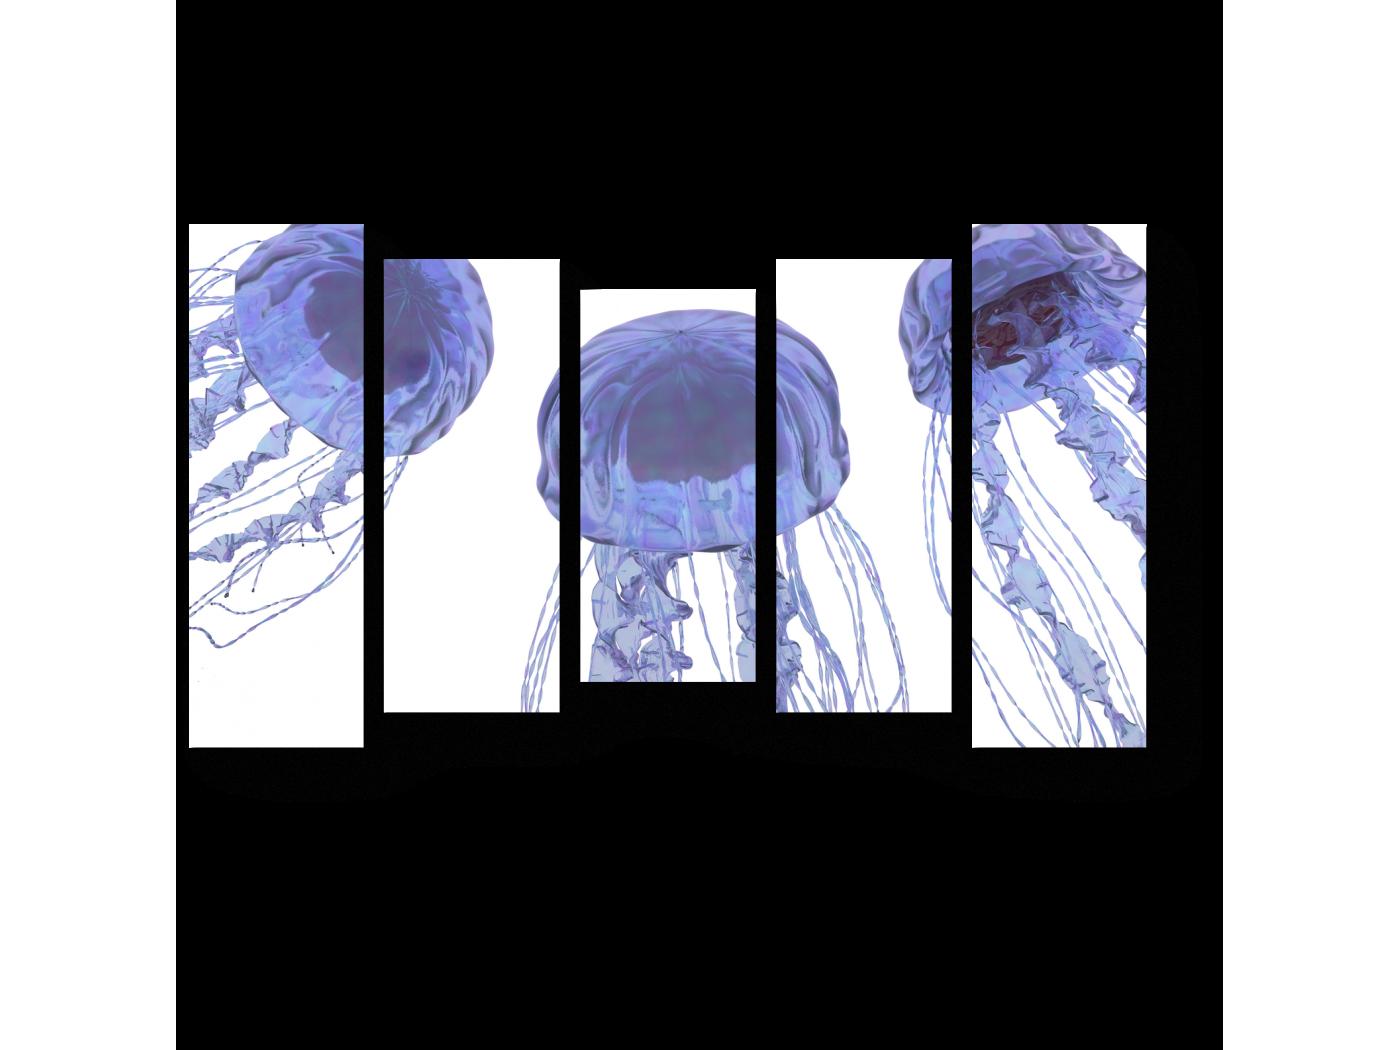 Модульная картина Пара голубоватых медуз (90x54) фото